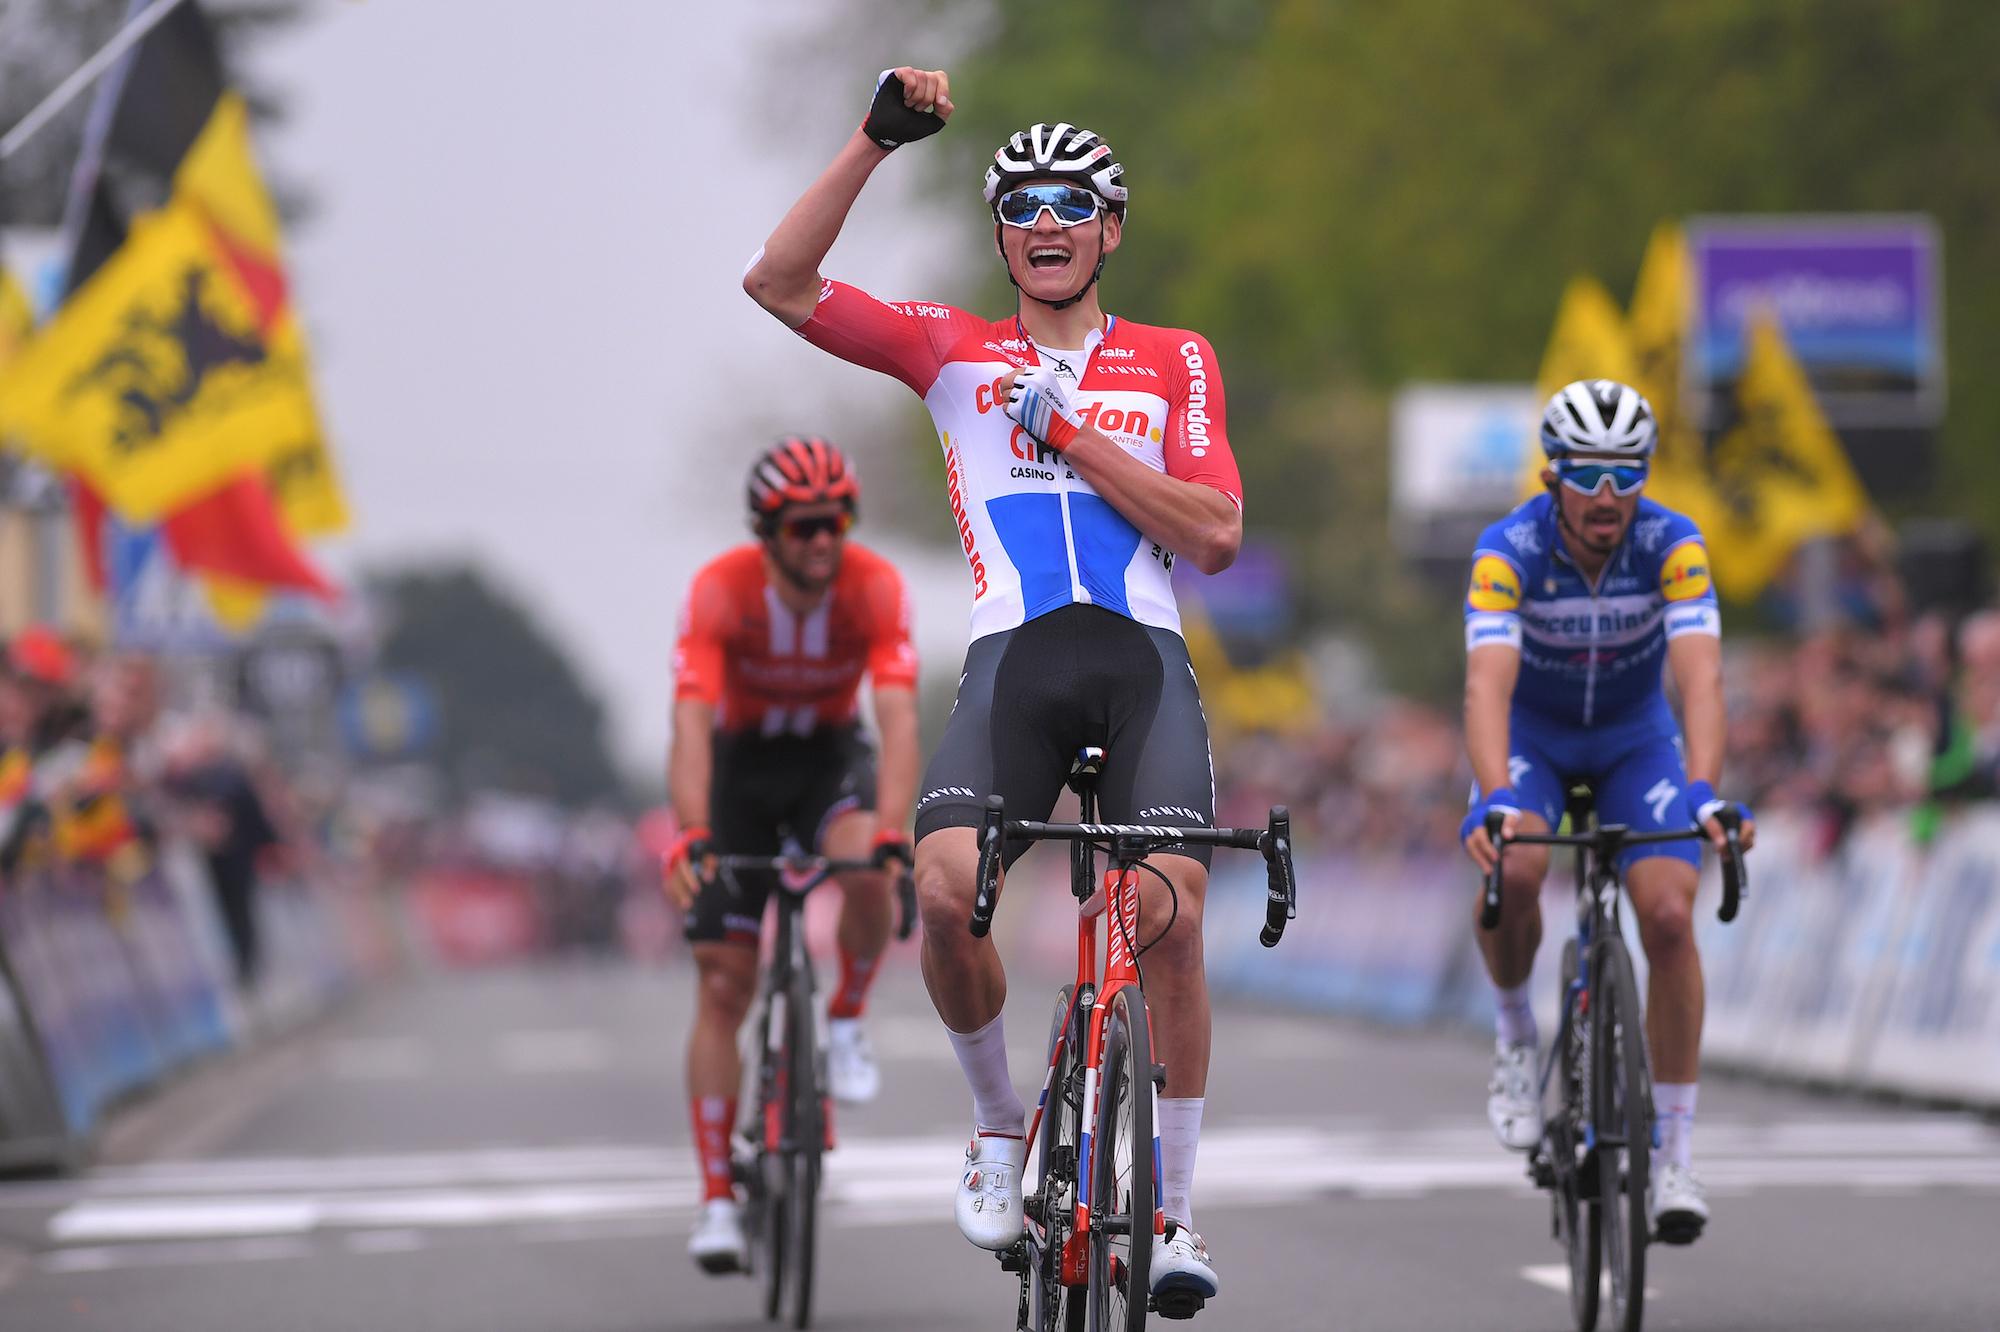 mathieu van der poel shows incredible strength to win de